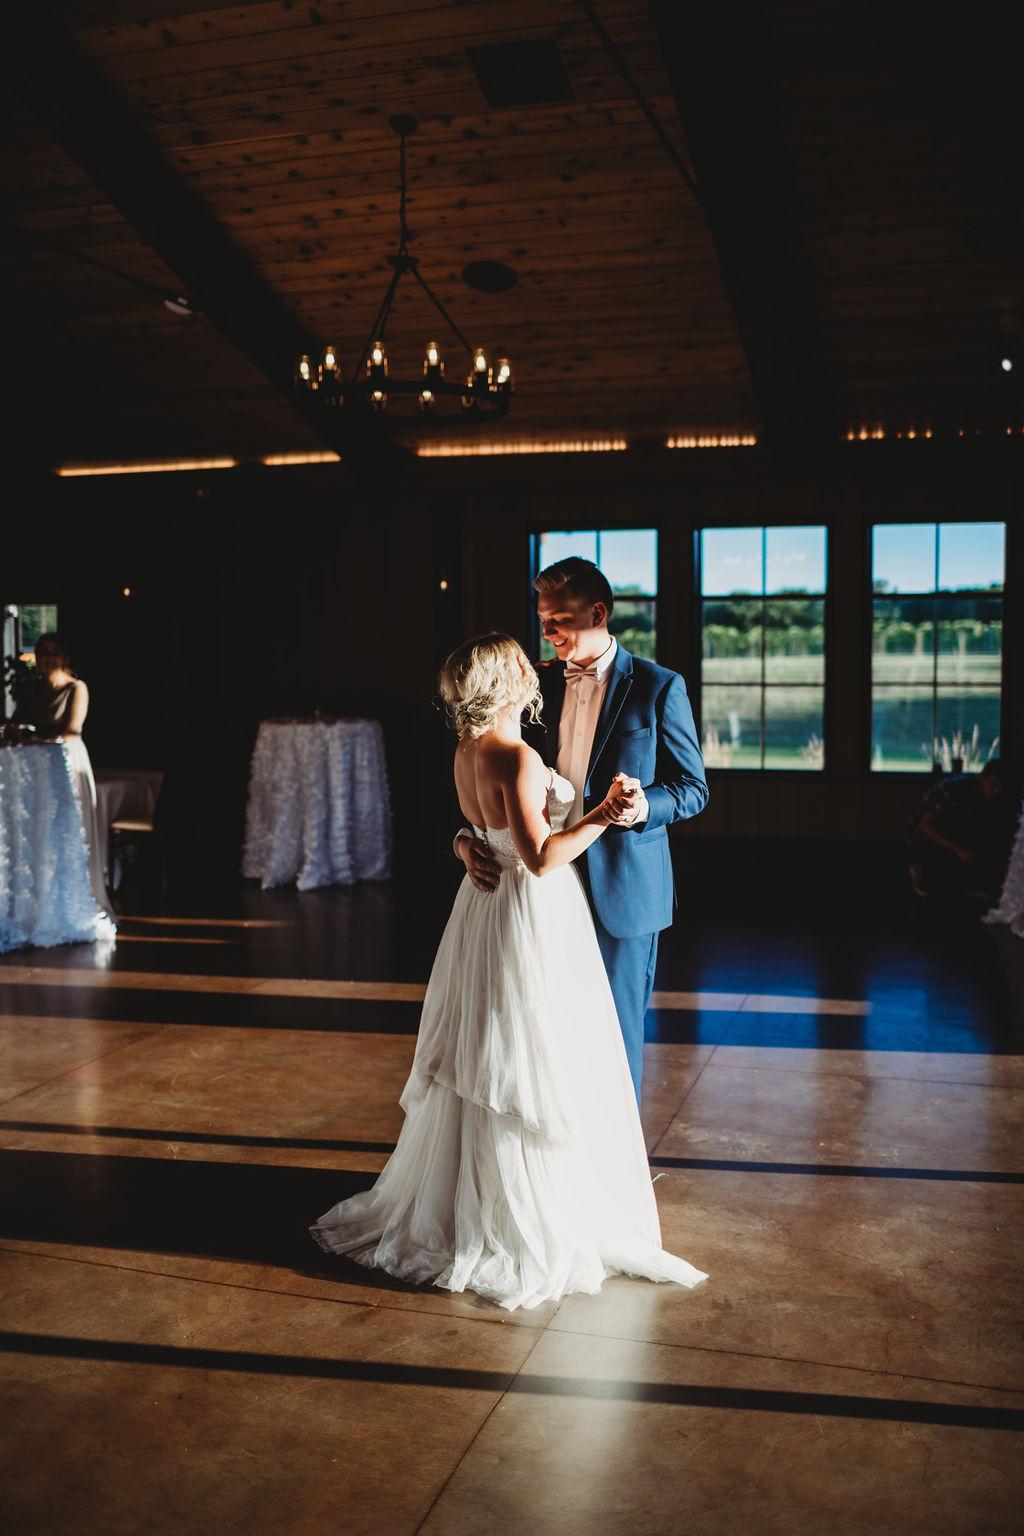 engle-olson-katie-dalton-wedding-clewell-photography-28.jpg